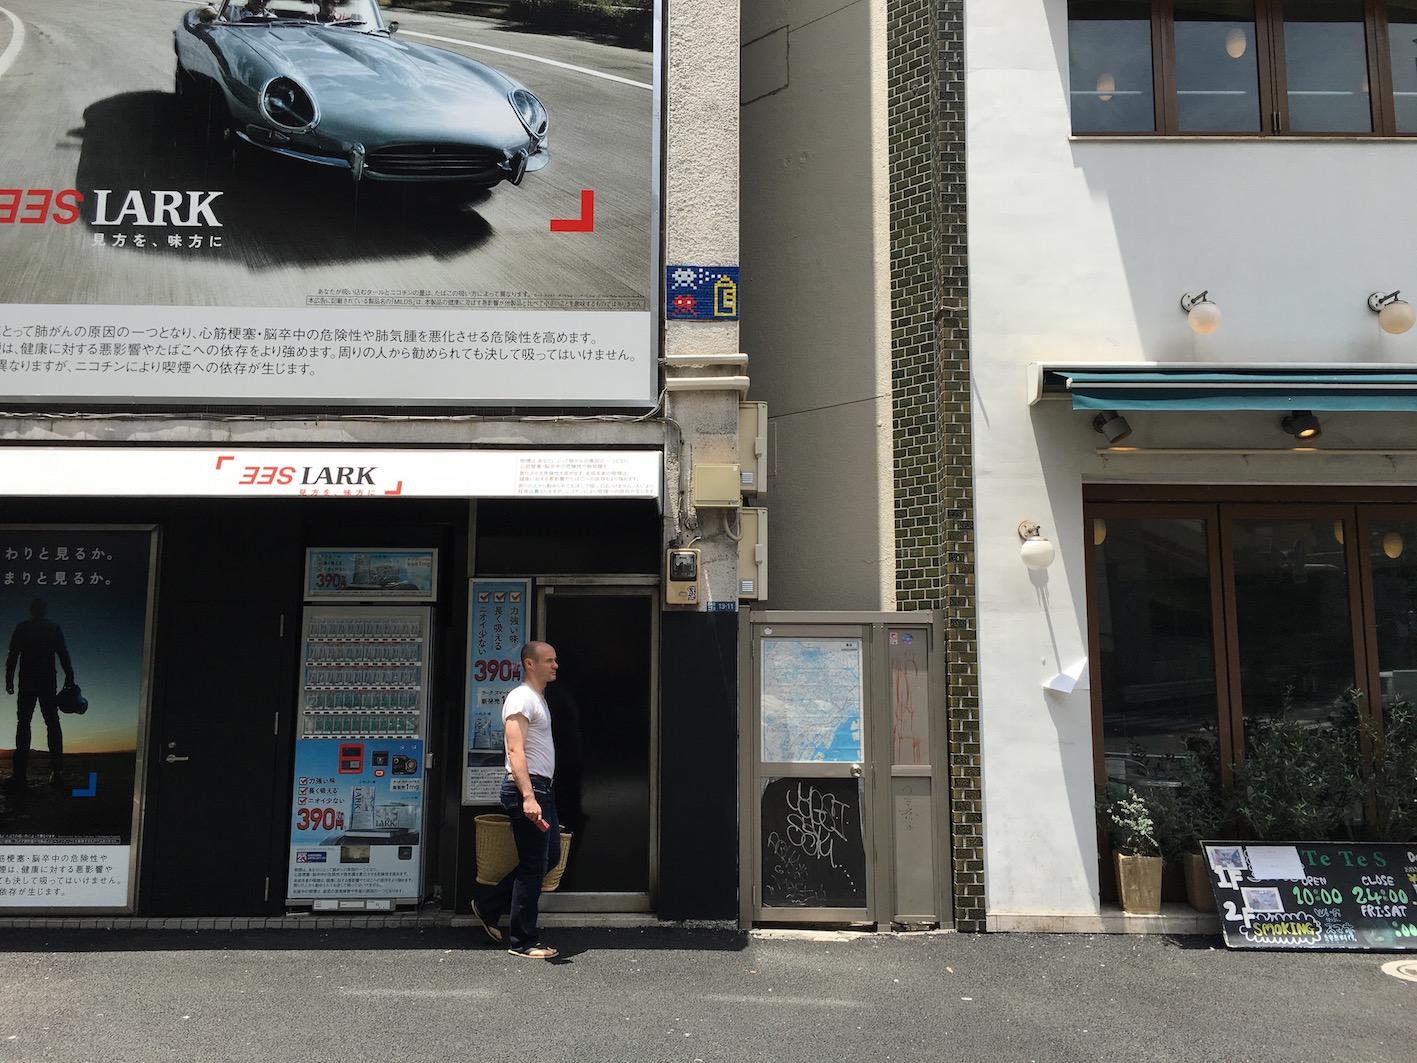 deansunshine_landofsunshine_melbourne_streetart_graffiti_tokyo invader 9